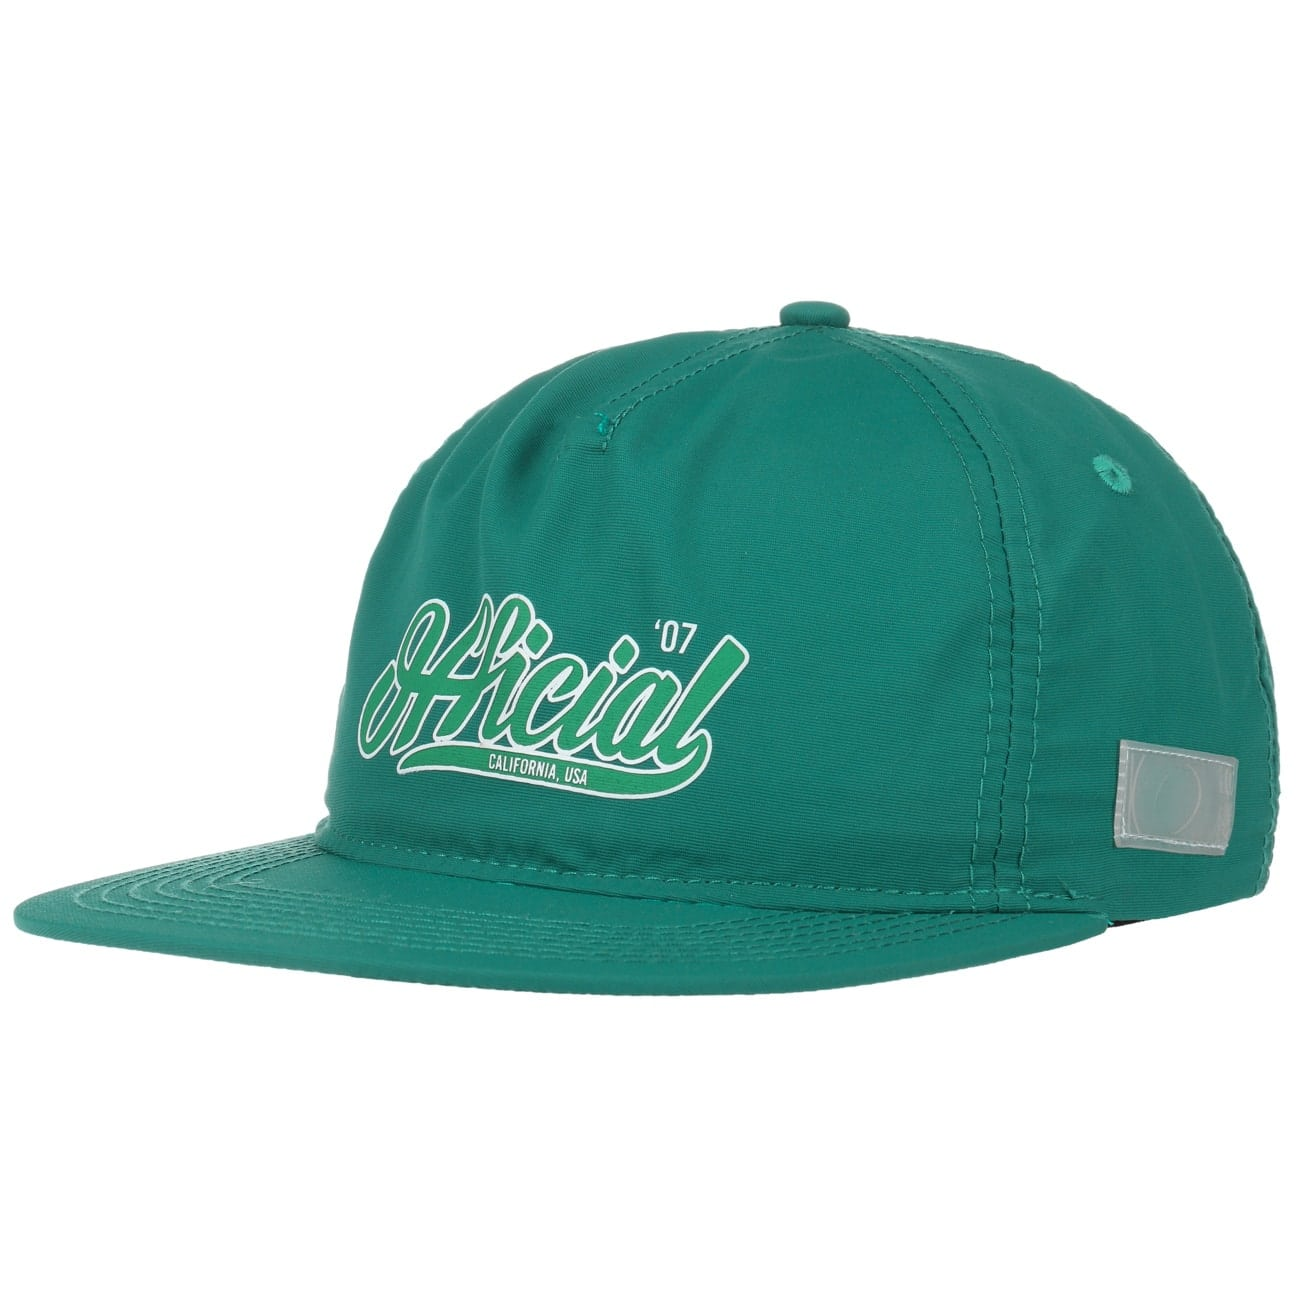 Casquette Script Strapback by Official Headwear  baseball cap